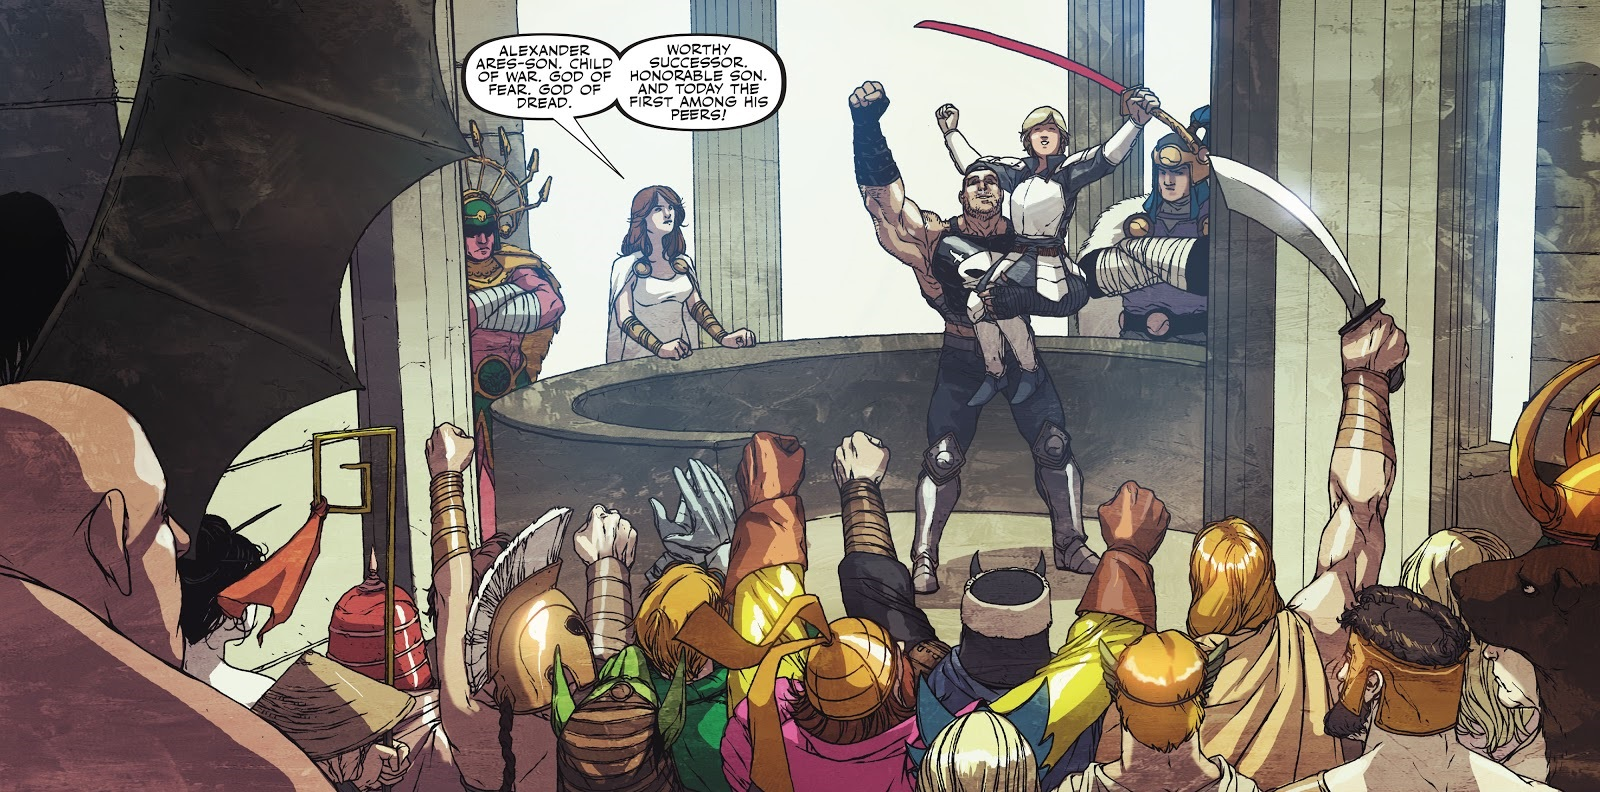 Secret Warriors Vol 1 10 Page 22-23.jpg